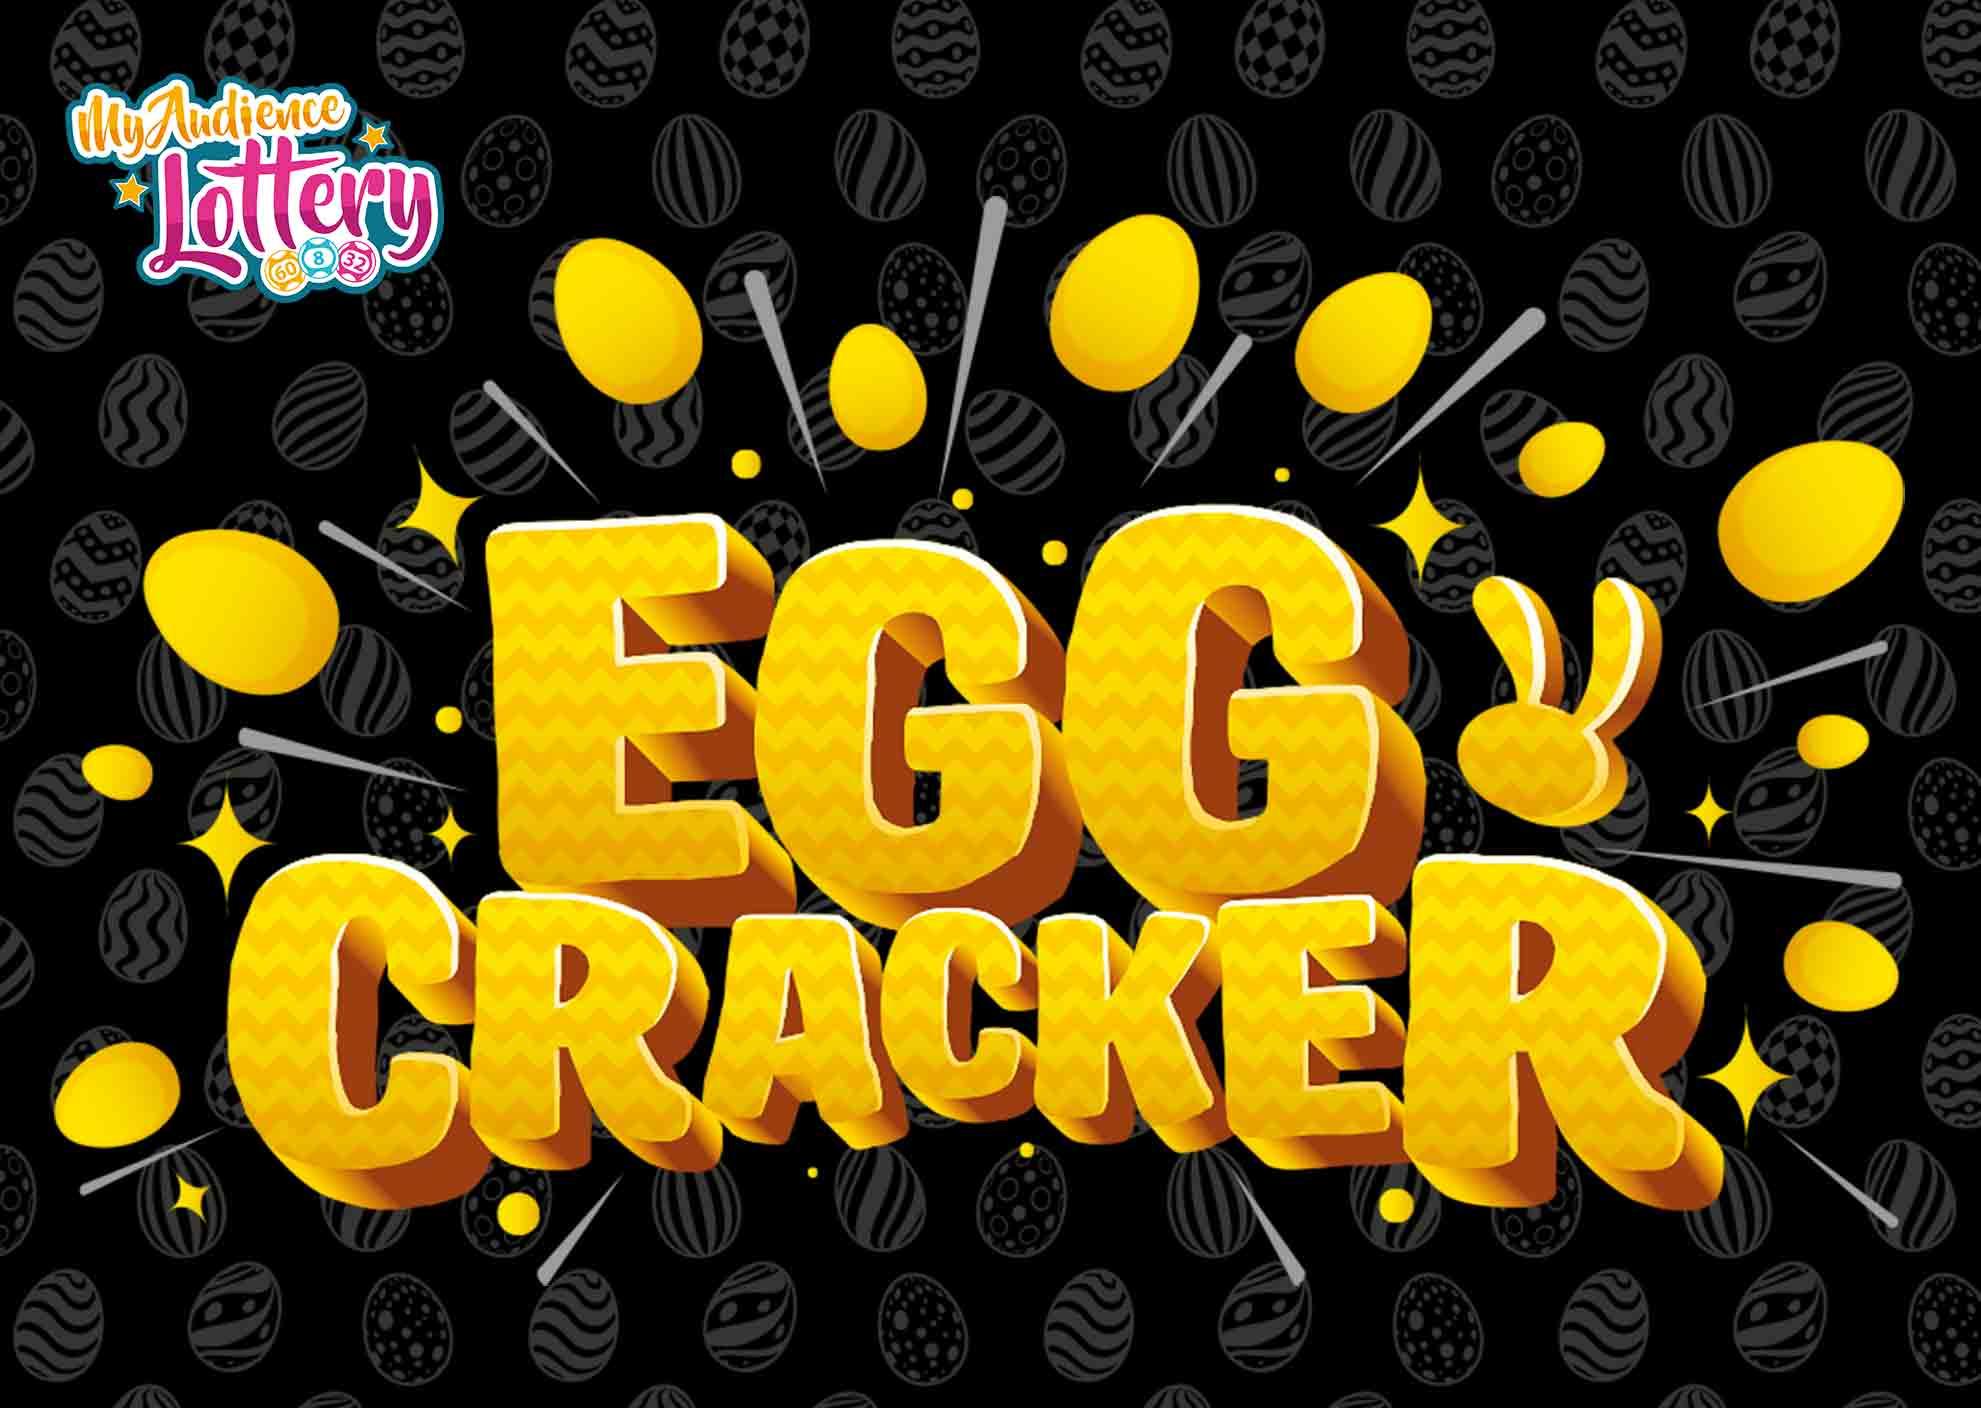 MyAudience Easter egg-cracker scratchcard